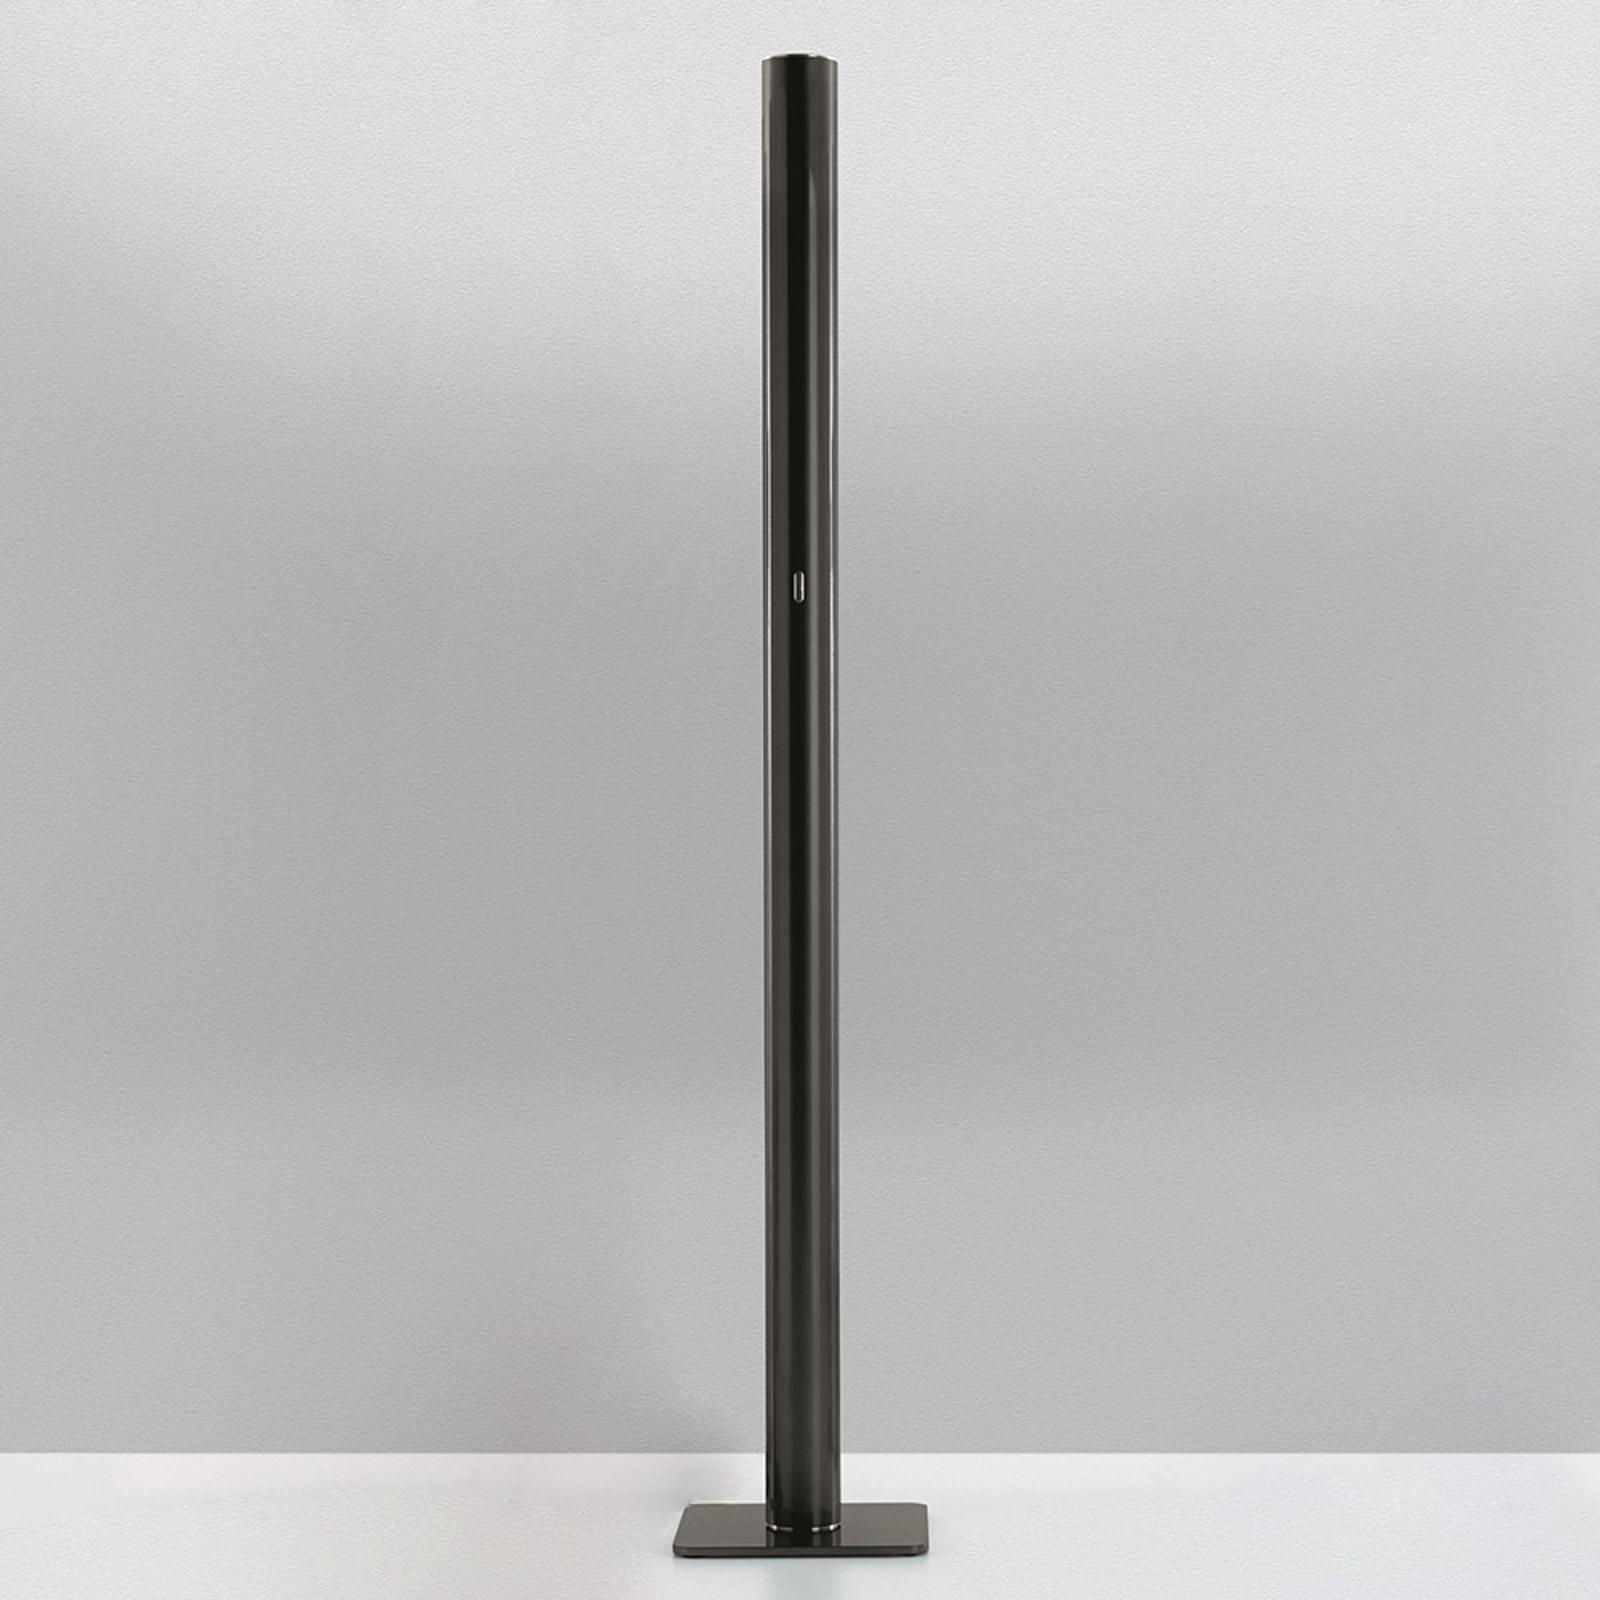 Artemide Ilio – LED-golvlampa, app, svart, 2 700 K